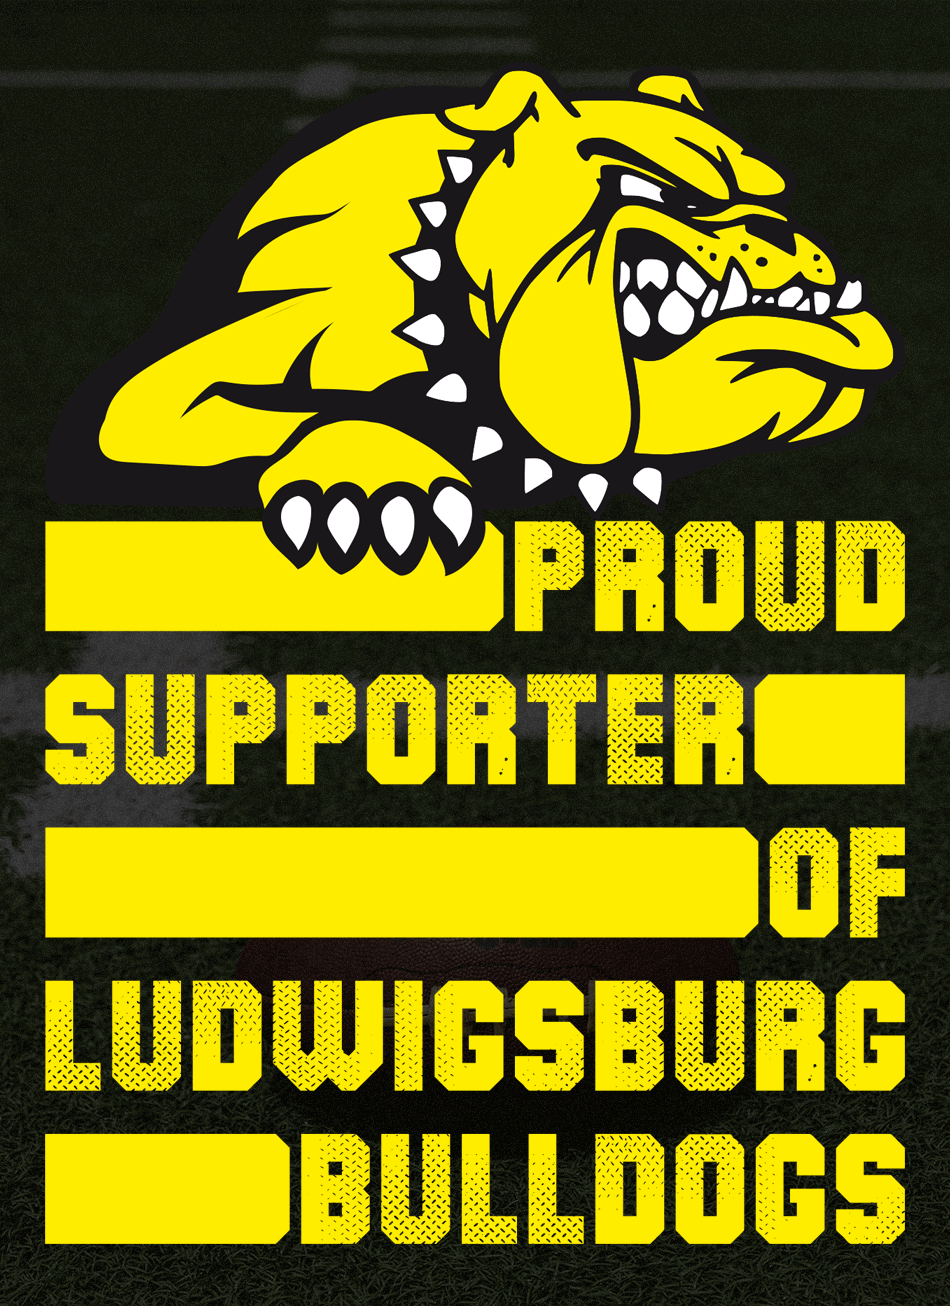 Ludwigsburg Bulldoggs